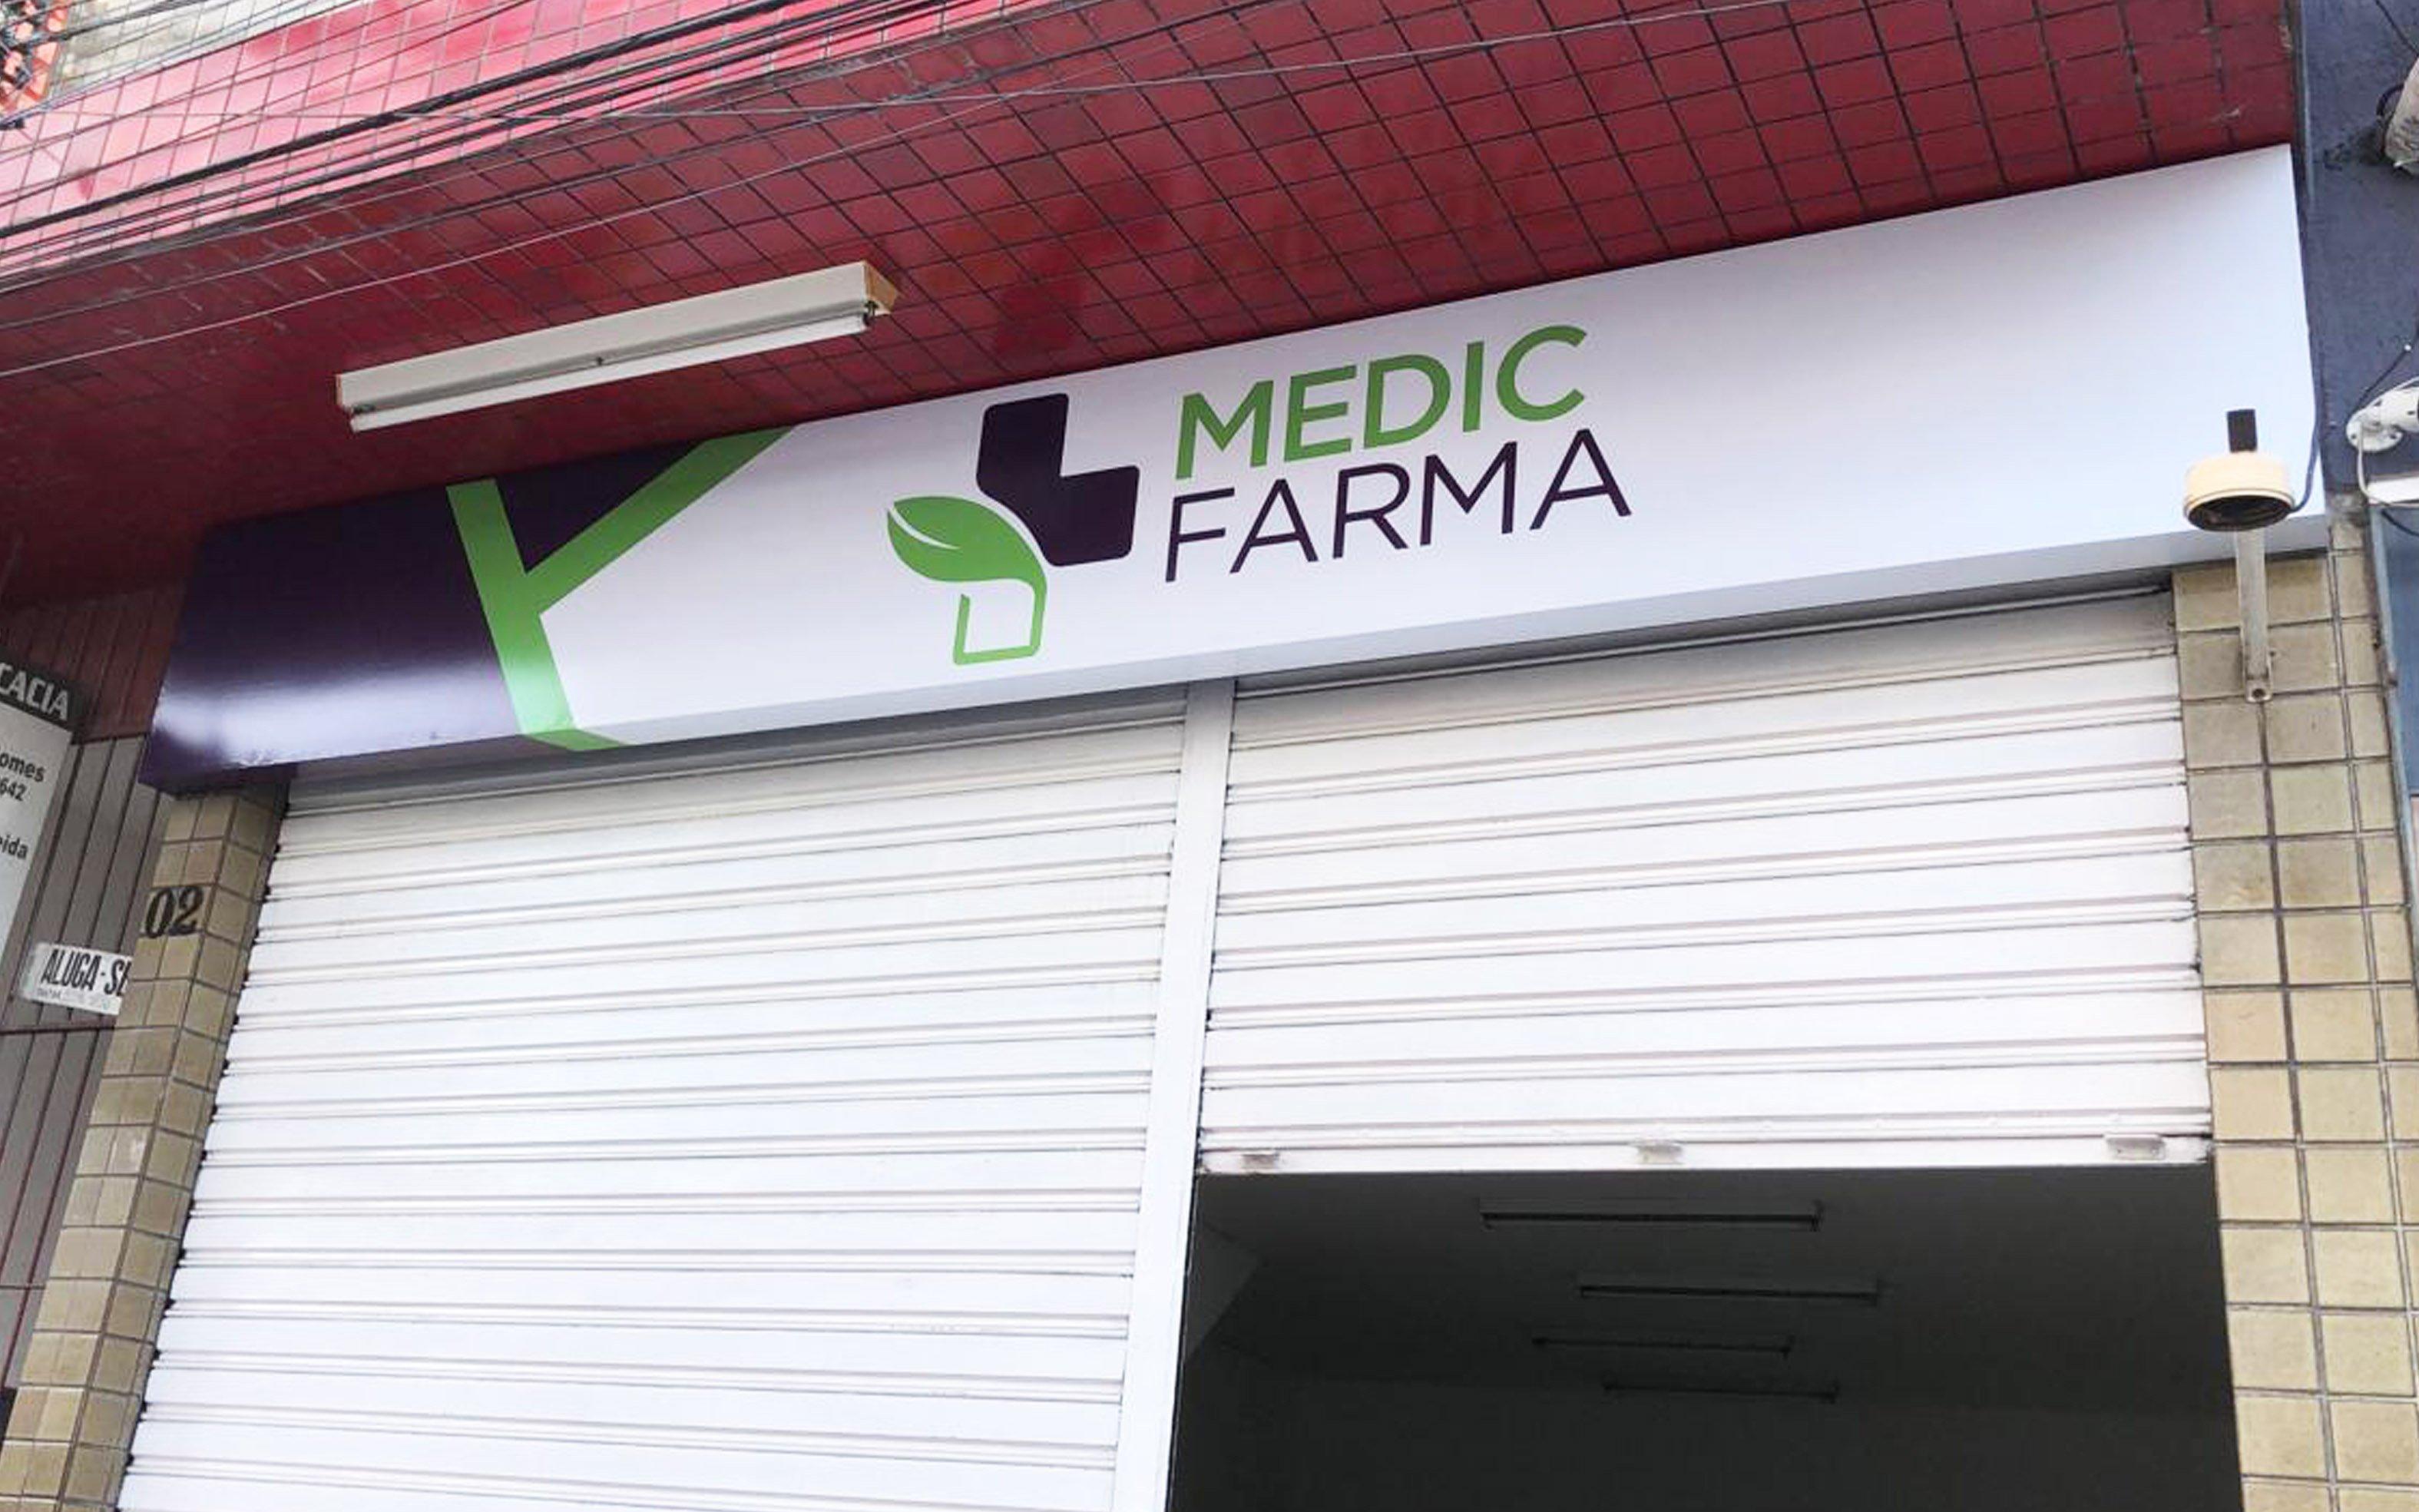 https://0201.nccdn.net/1_2/000/000/13a/c2f/Atelier2-Medic-Farma-3150x1969.jpg